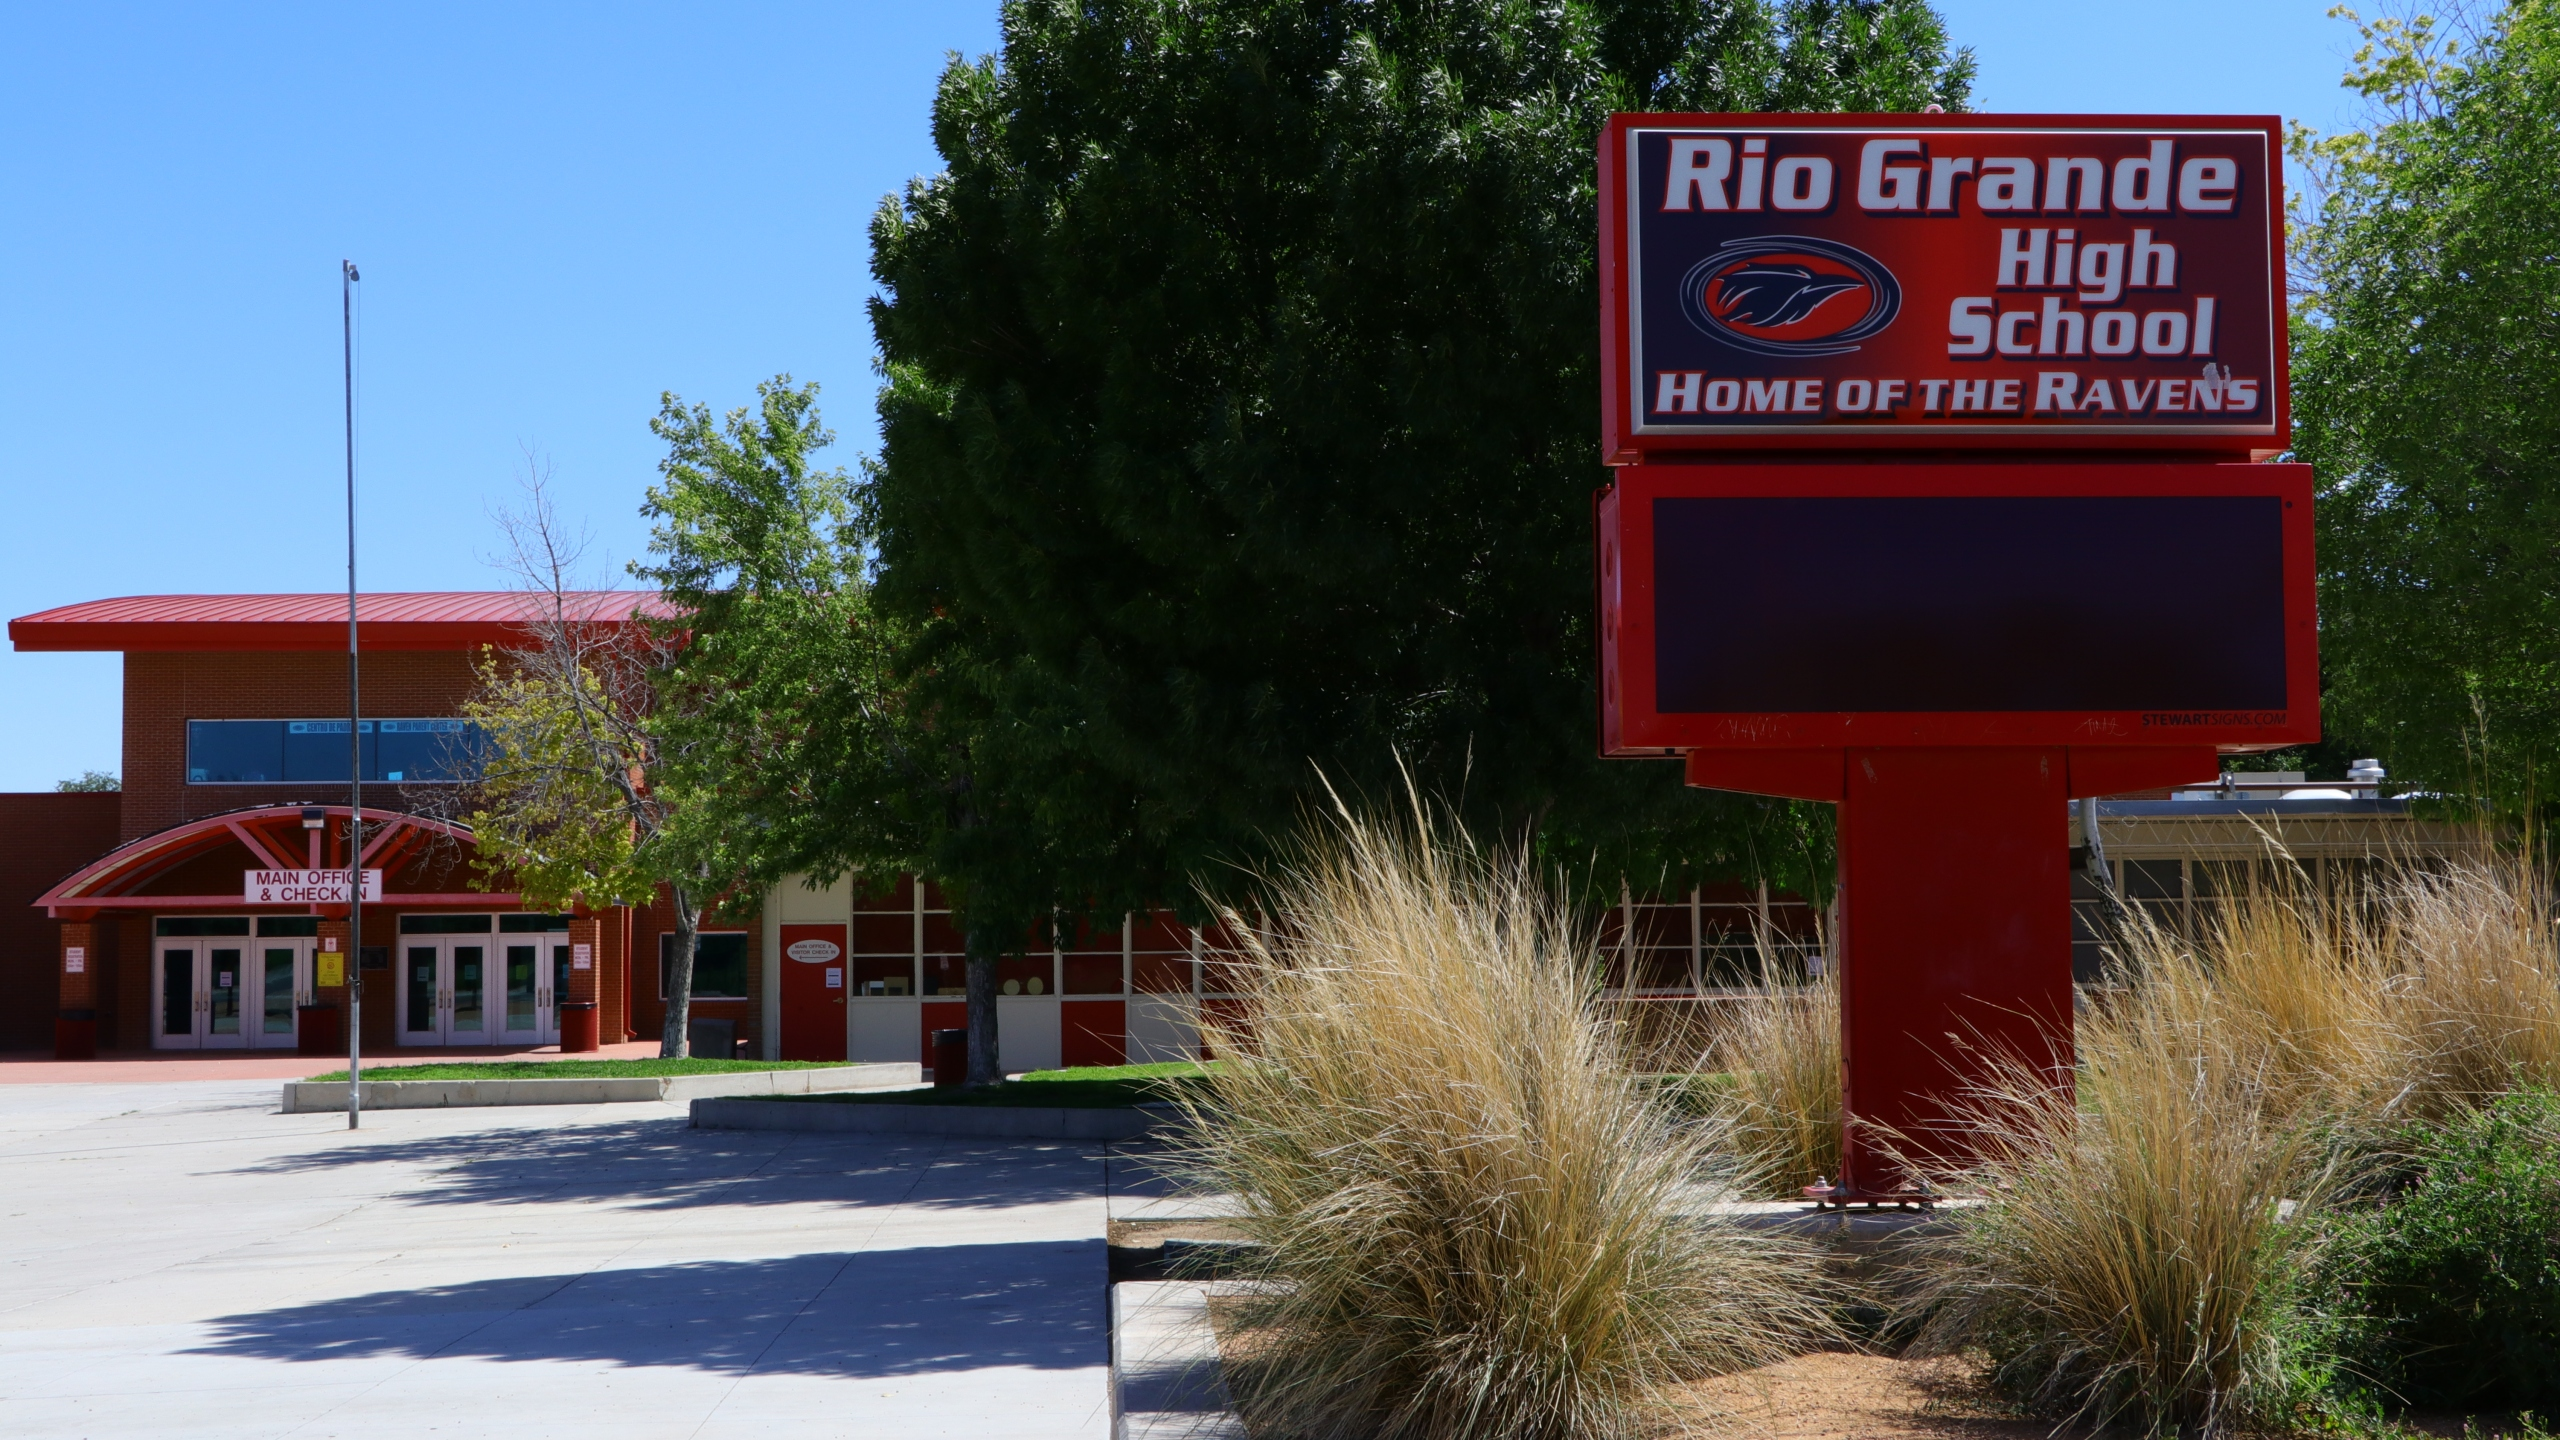 stockimg - Rio Grande High School